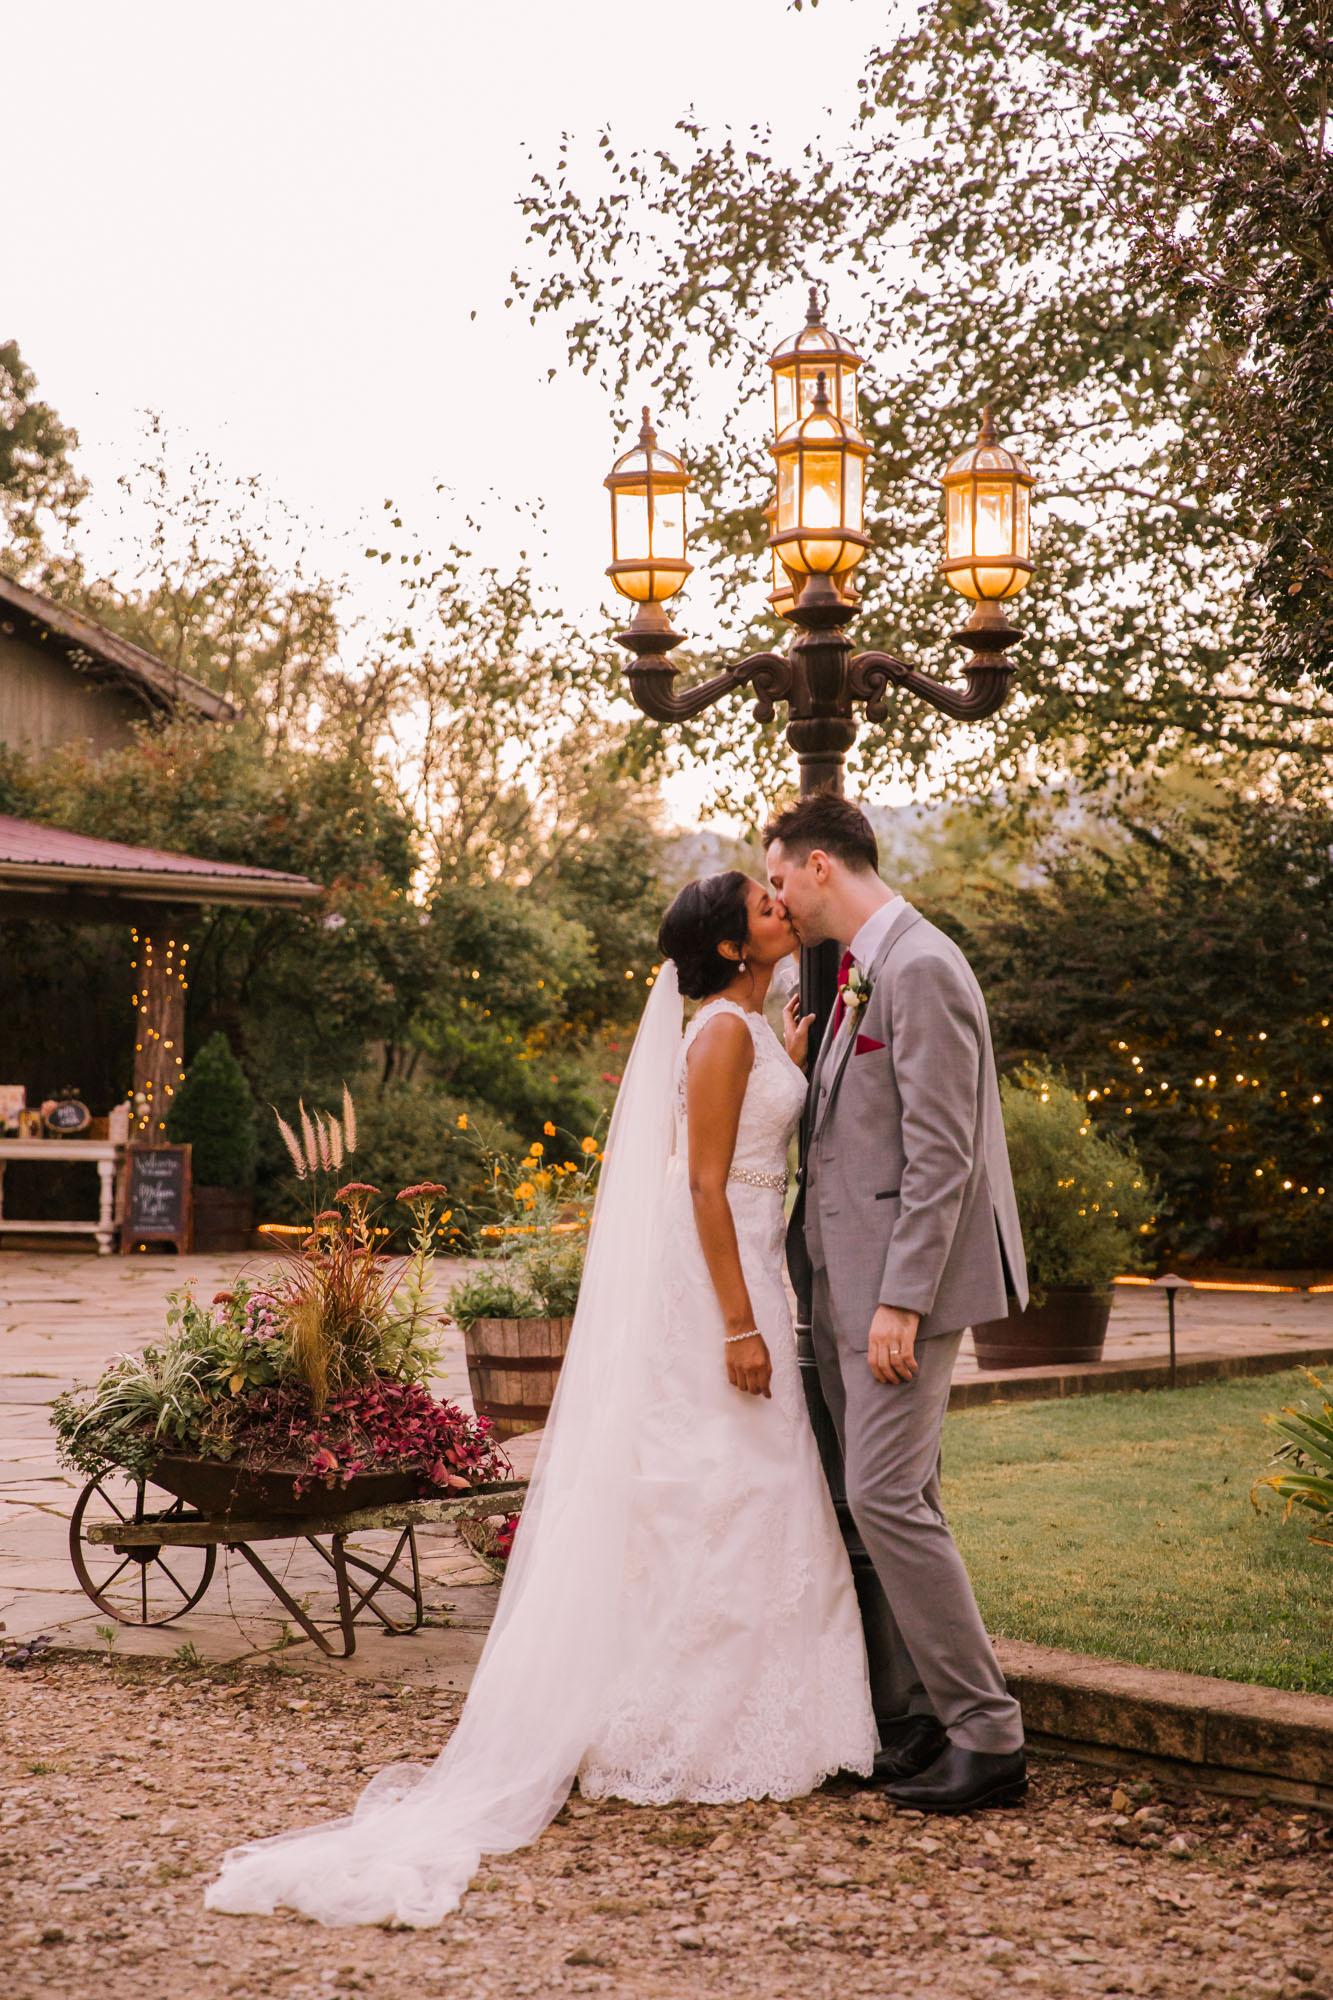 Waynesville NC Wedding Photography | Bride and Groom Kissing Under Lamppost